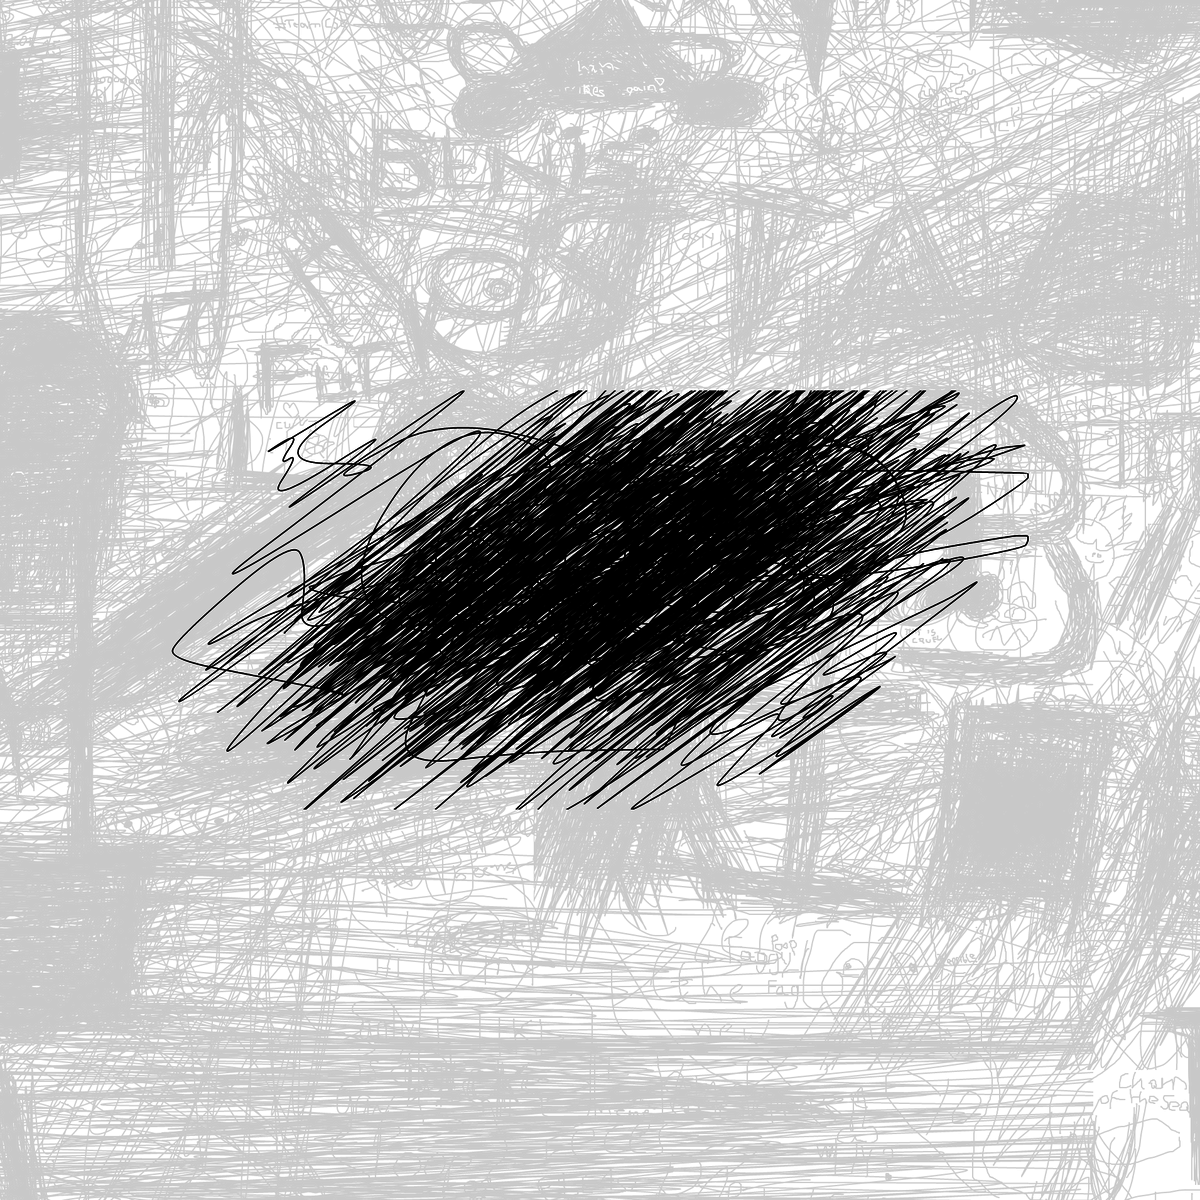 BAAAM drawing#20299 lat:52.4751930236816400lng: 13.4069671630859380